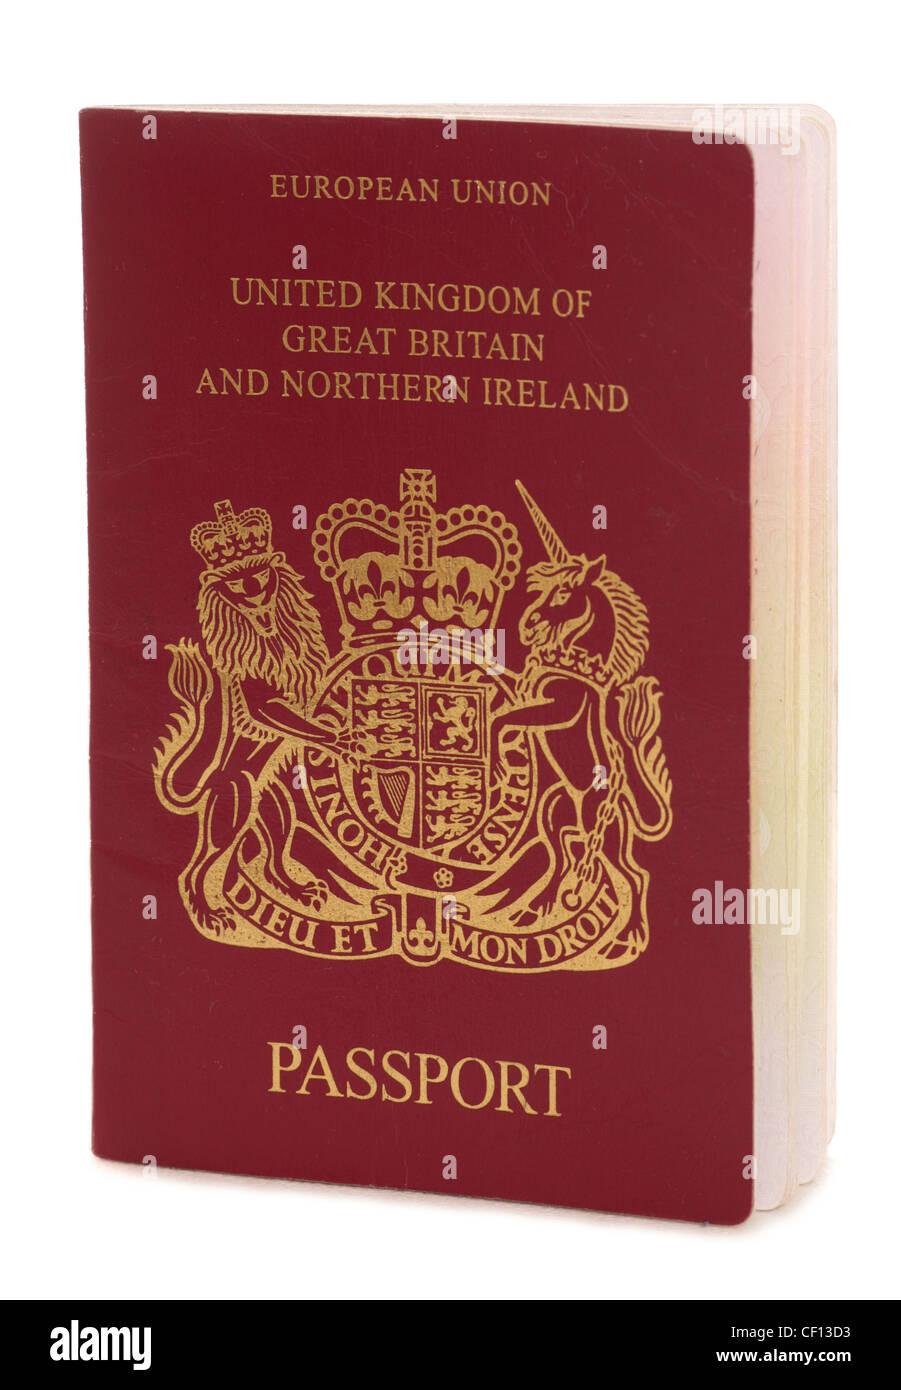 British passport on a white background - Stock Image